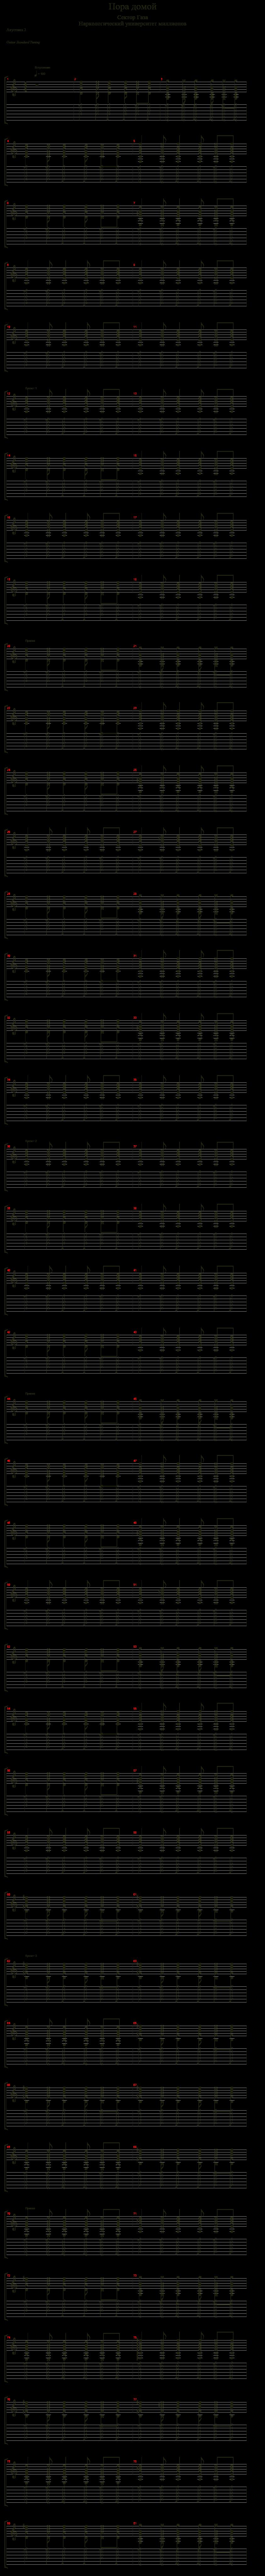 Gtptabsru табы для guitar pro